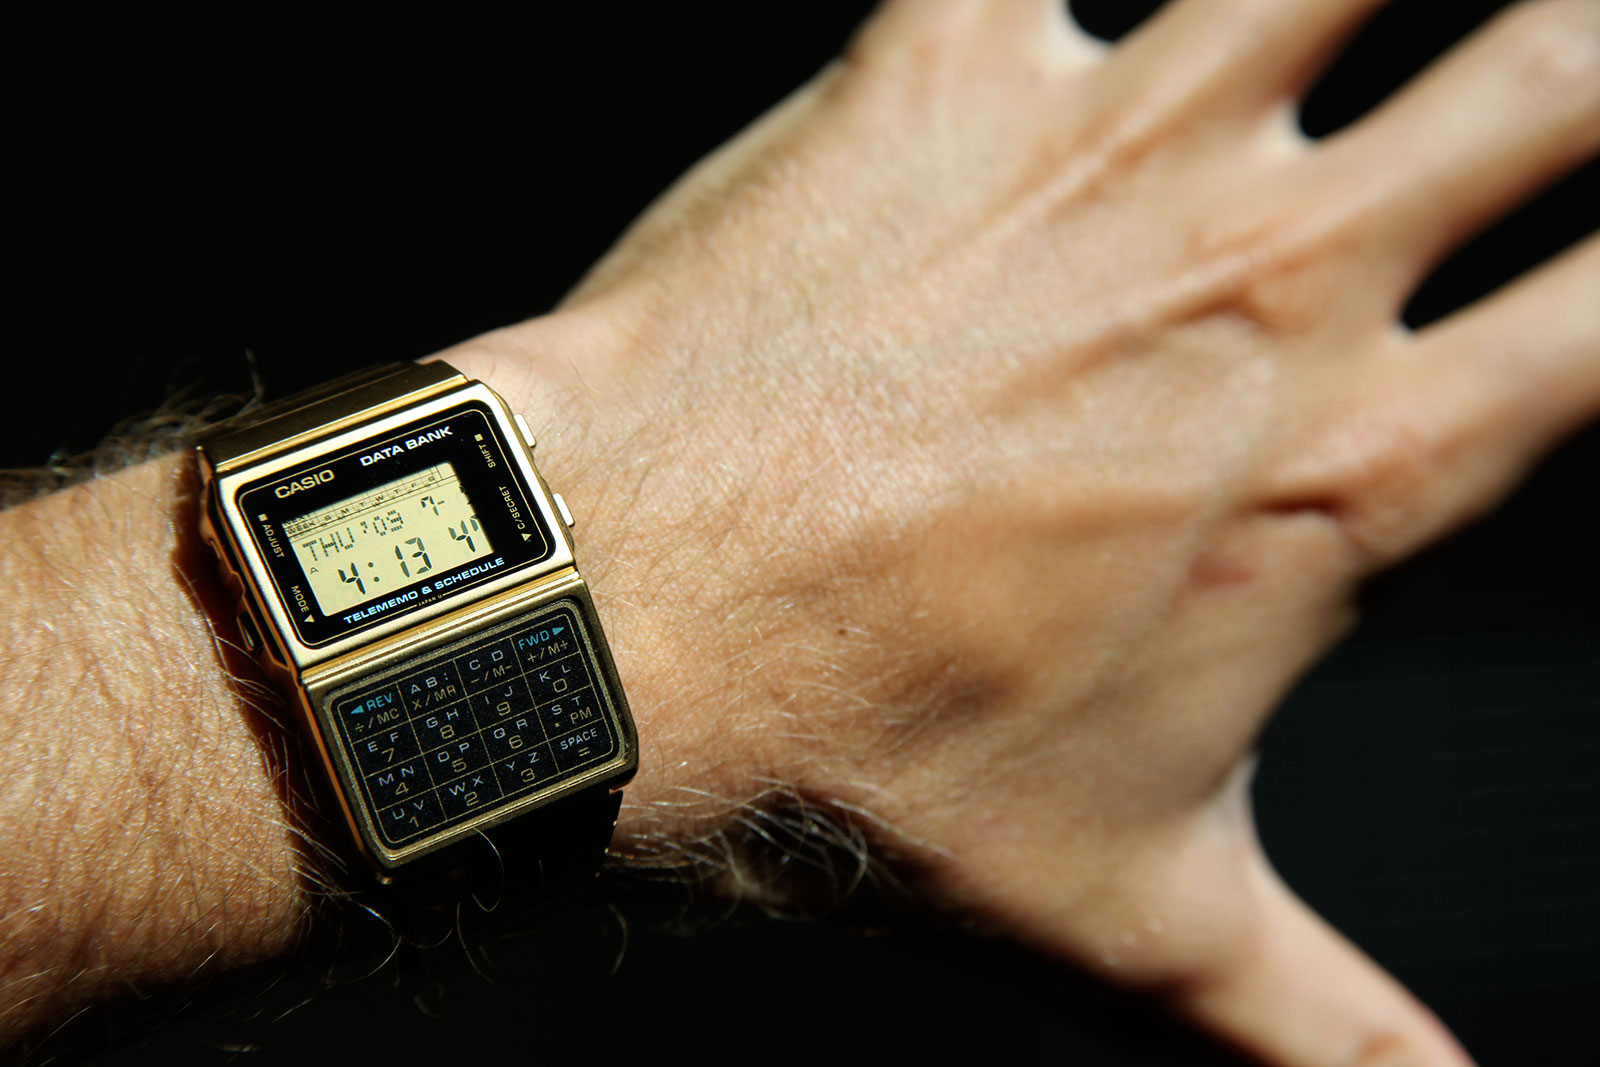 Casio Databank CD-40: The Original Smart Watch